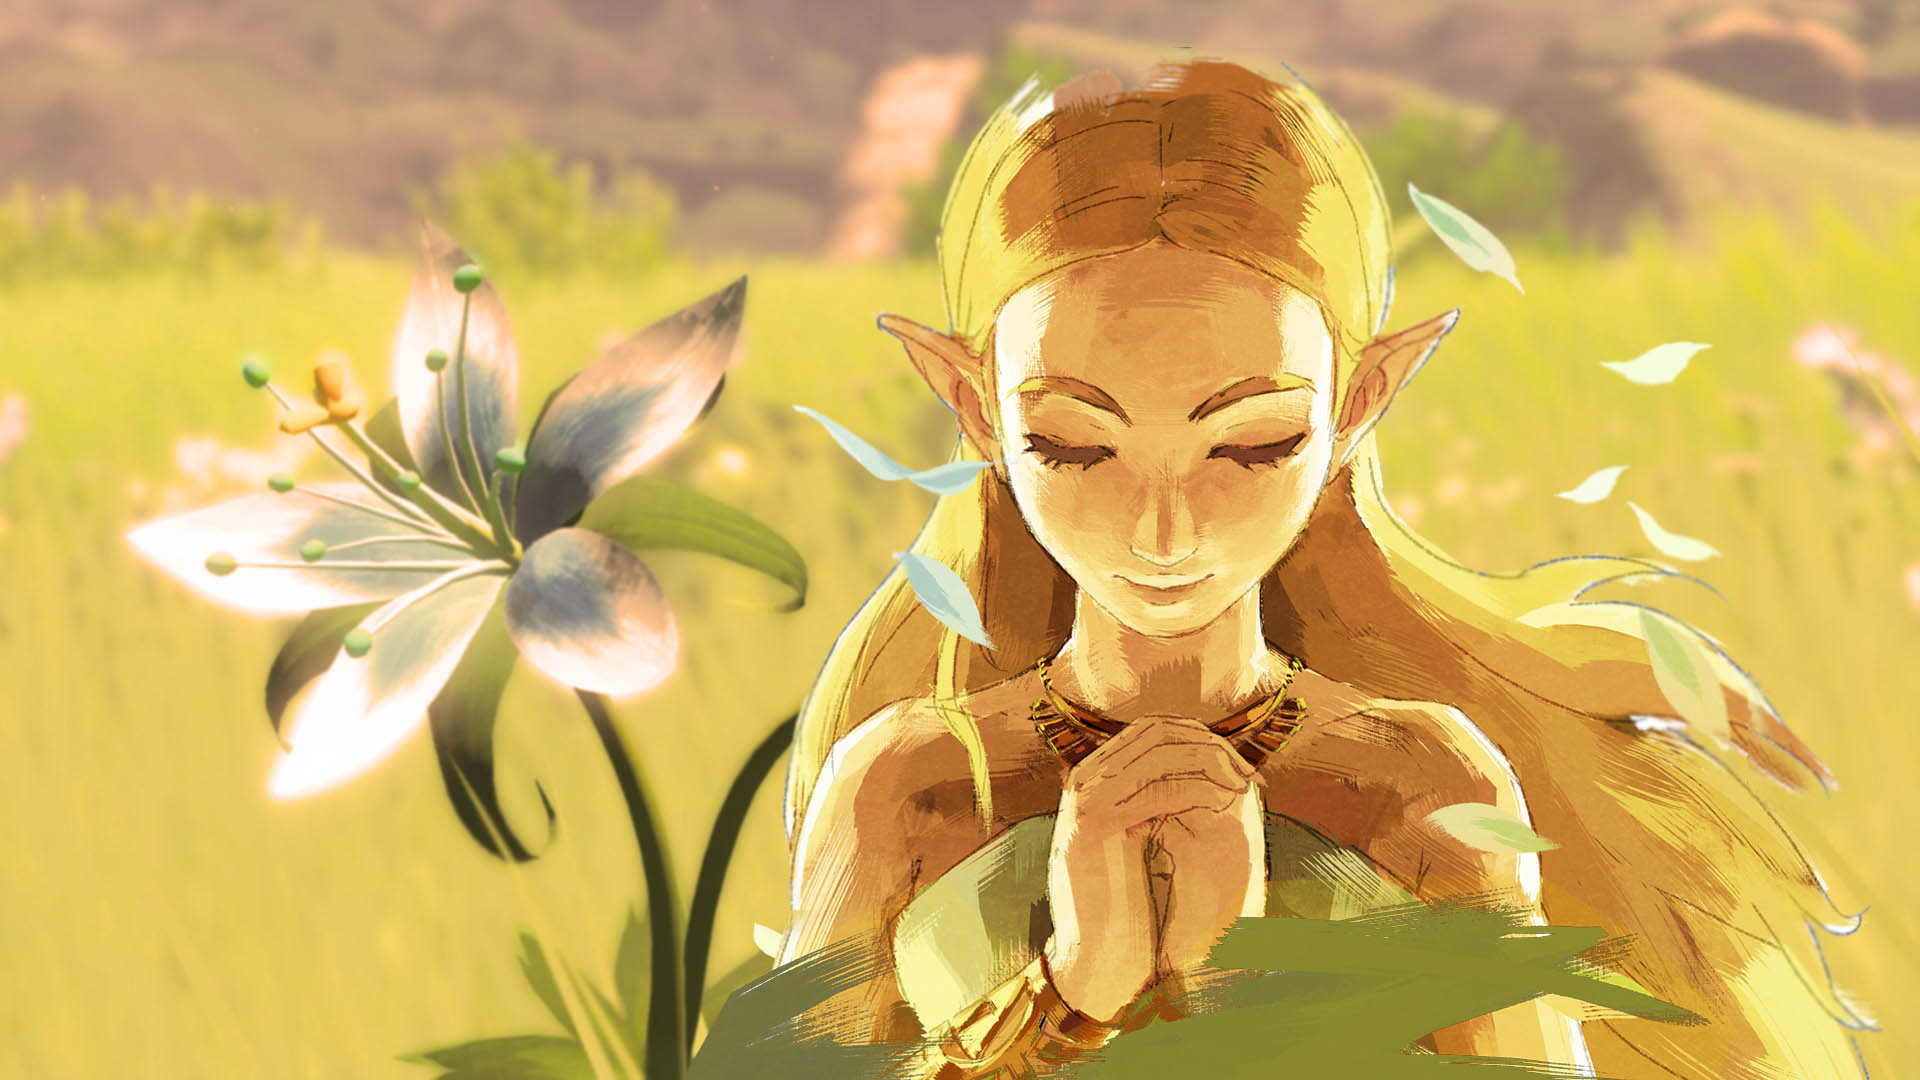 Animal Crossing Wild World Wallpaper Video Japan Expo Paris The Legend Of Zelda Panel Fully